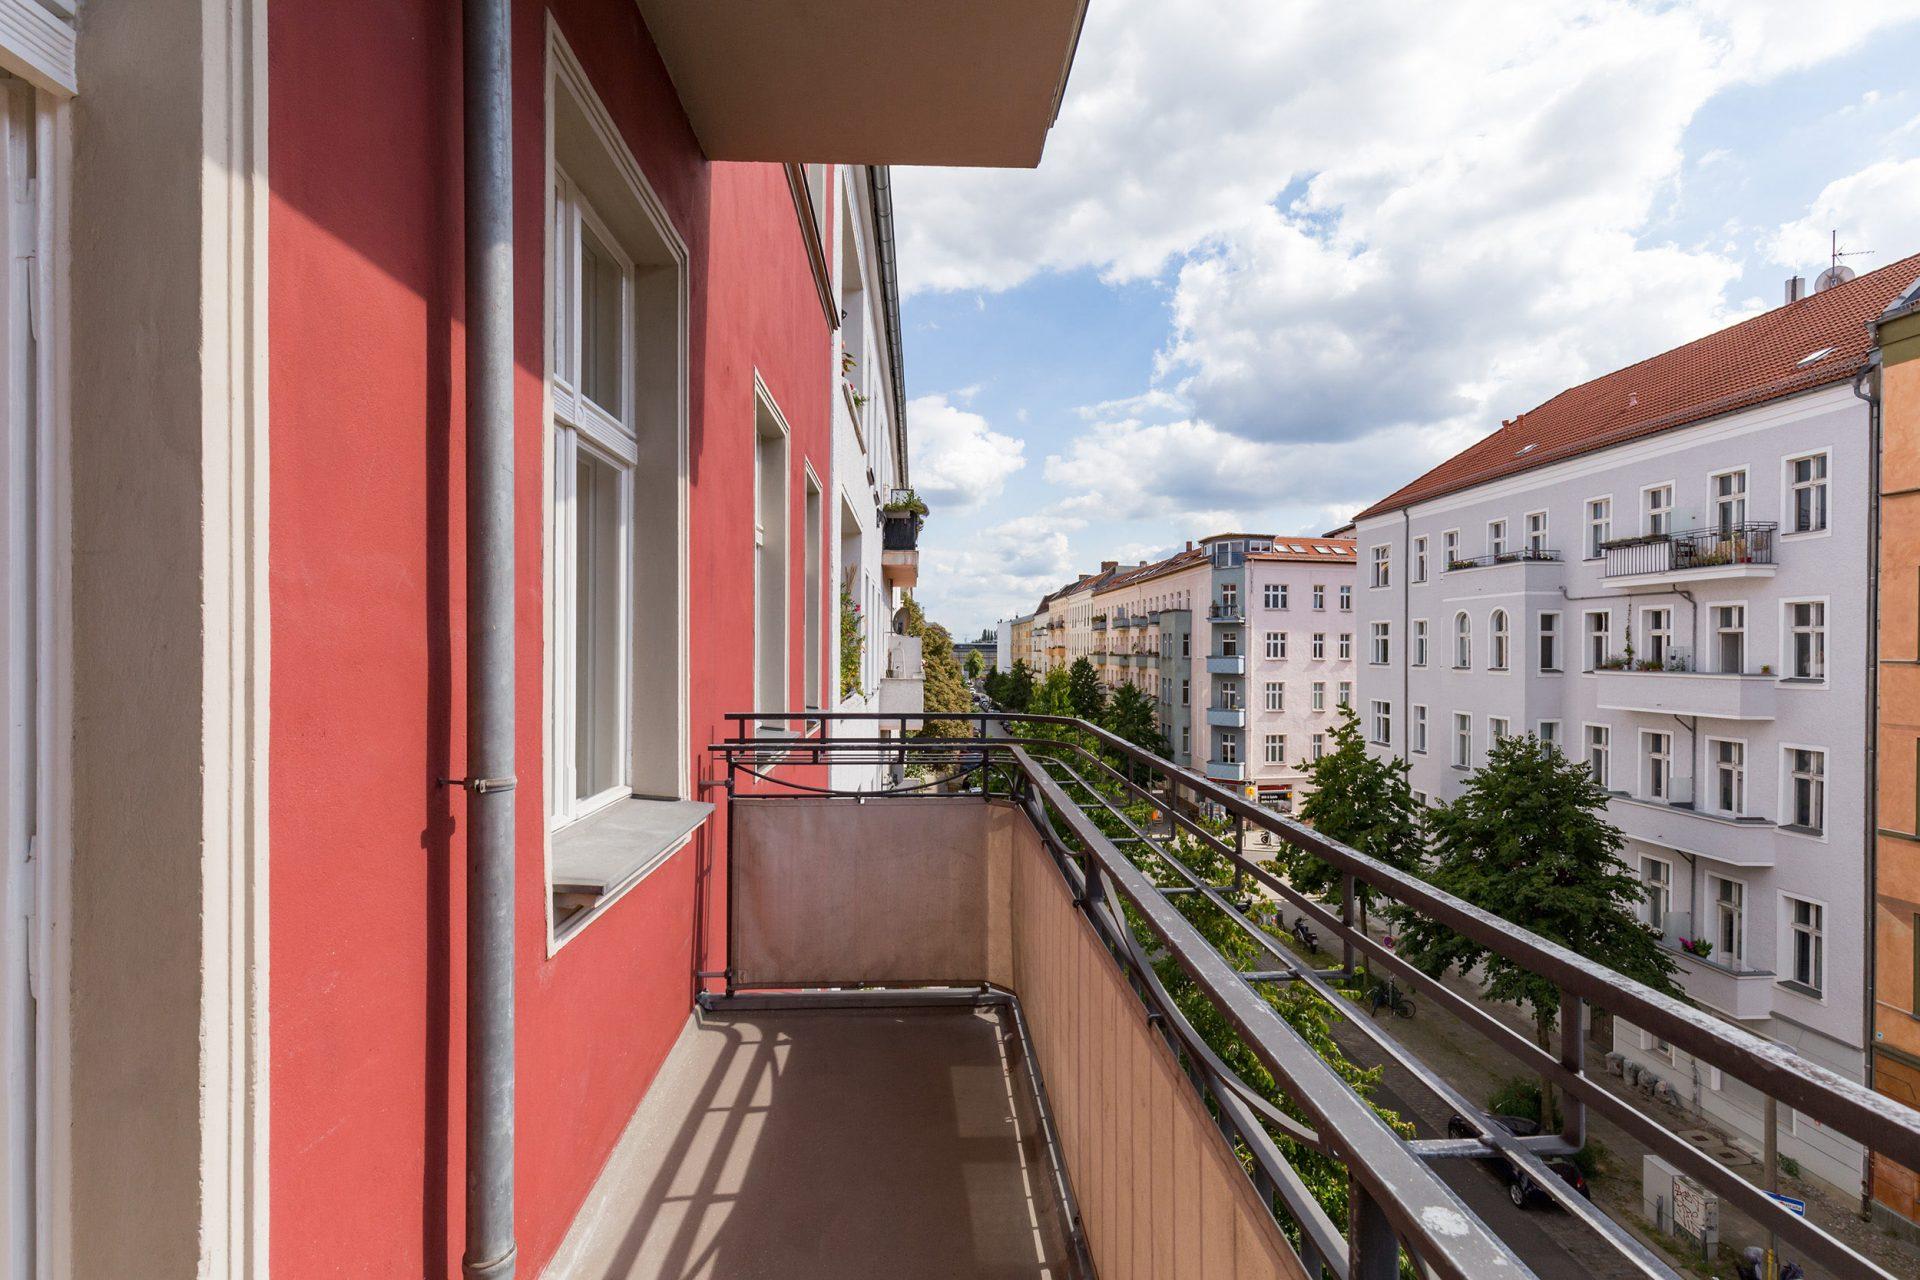 Immobilienfotografie Balkon ©offenblende.de